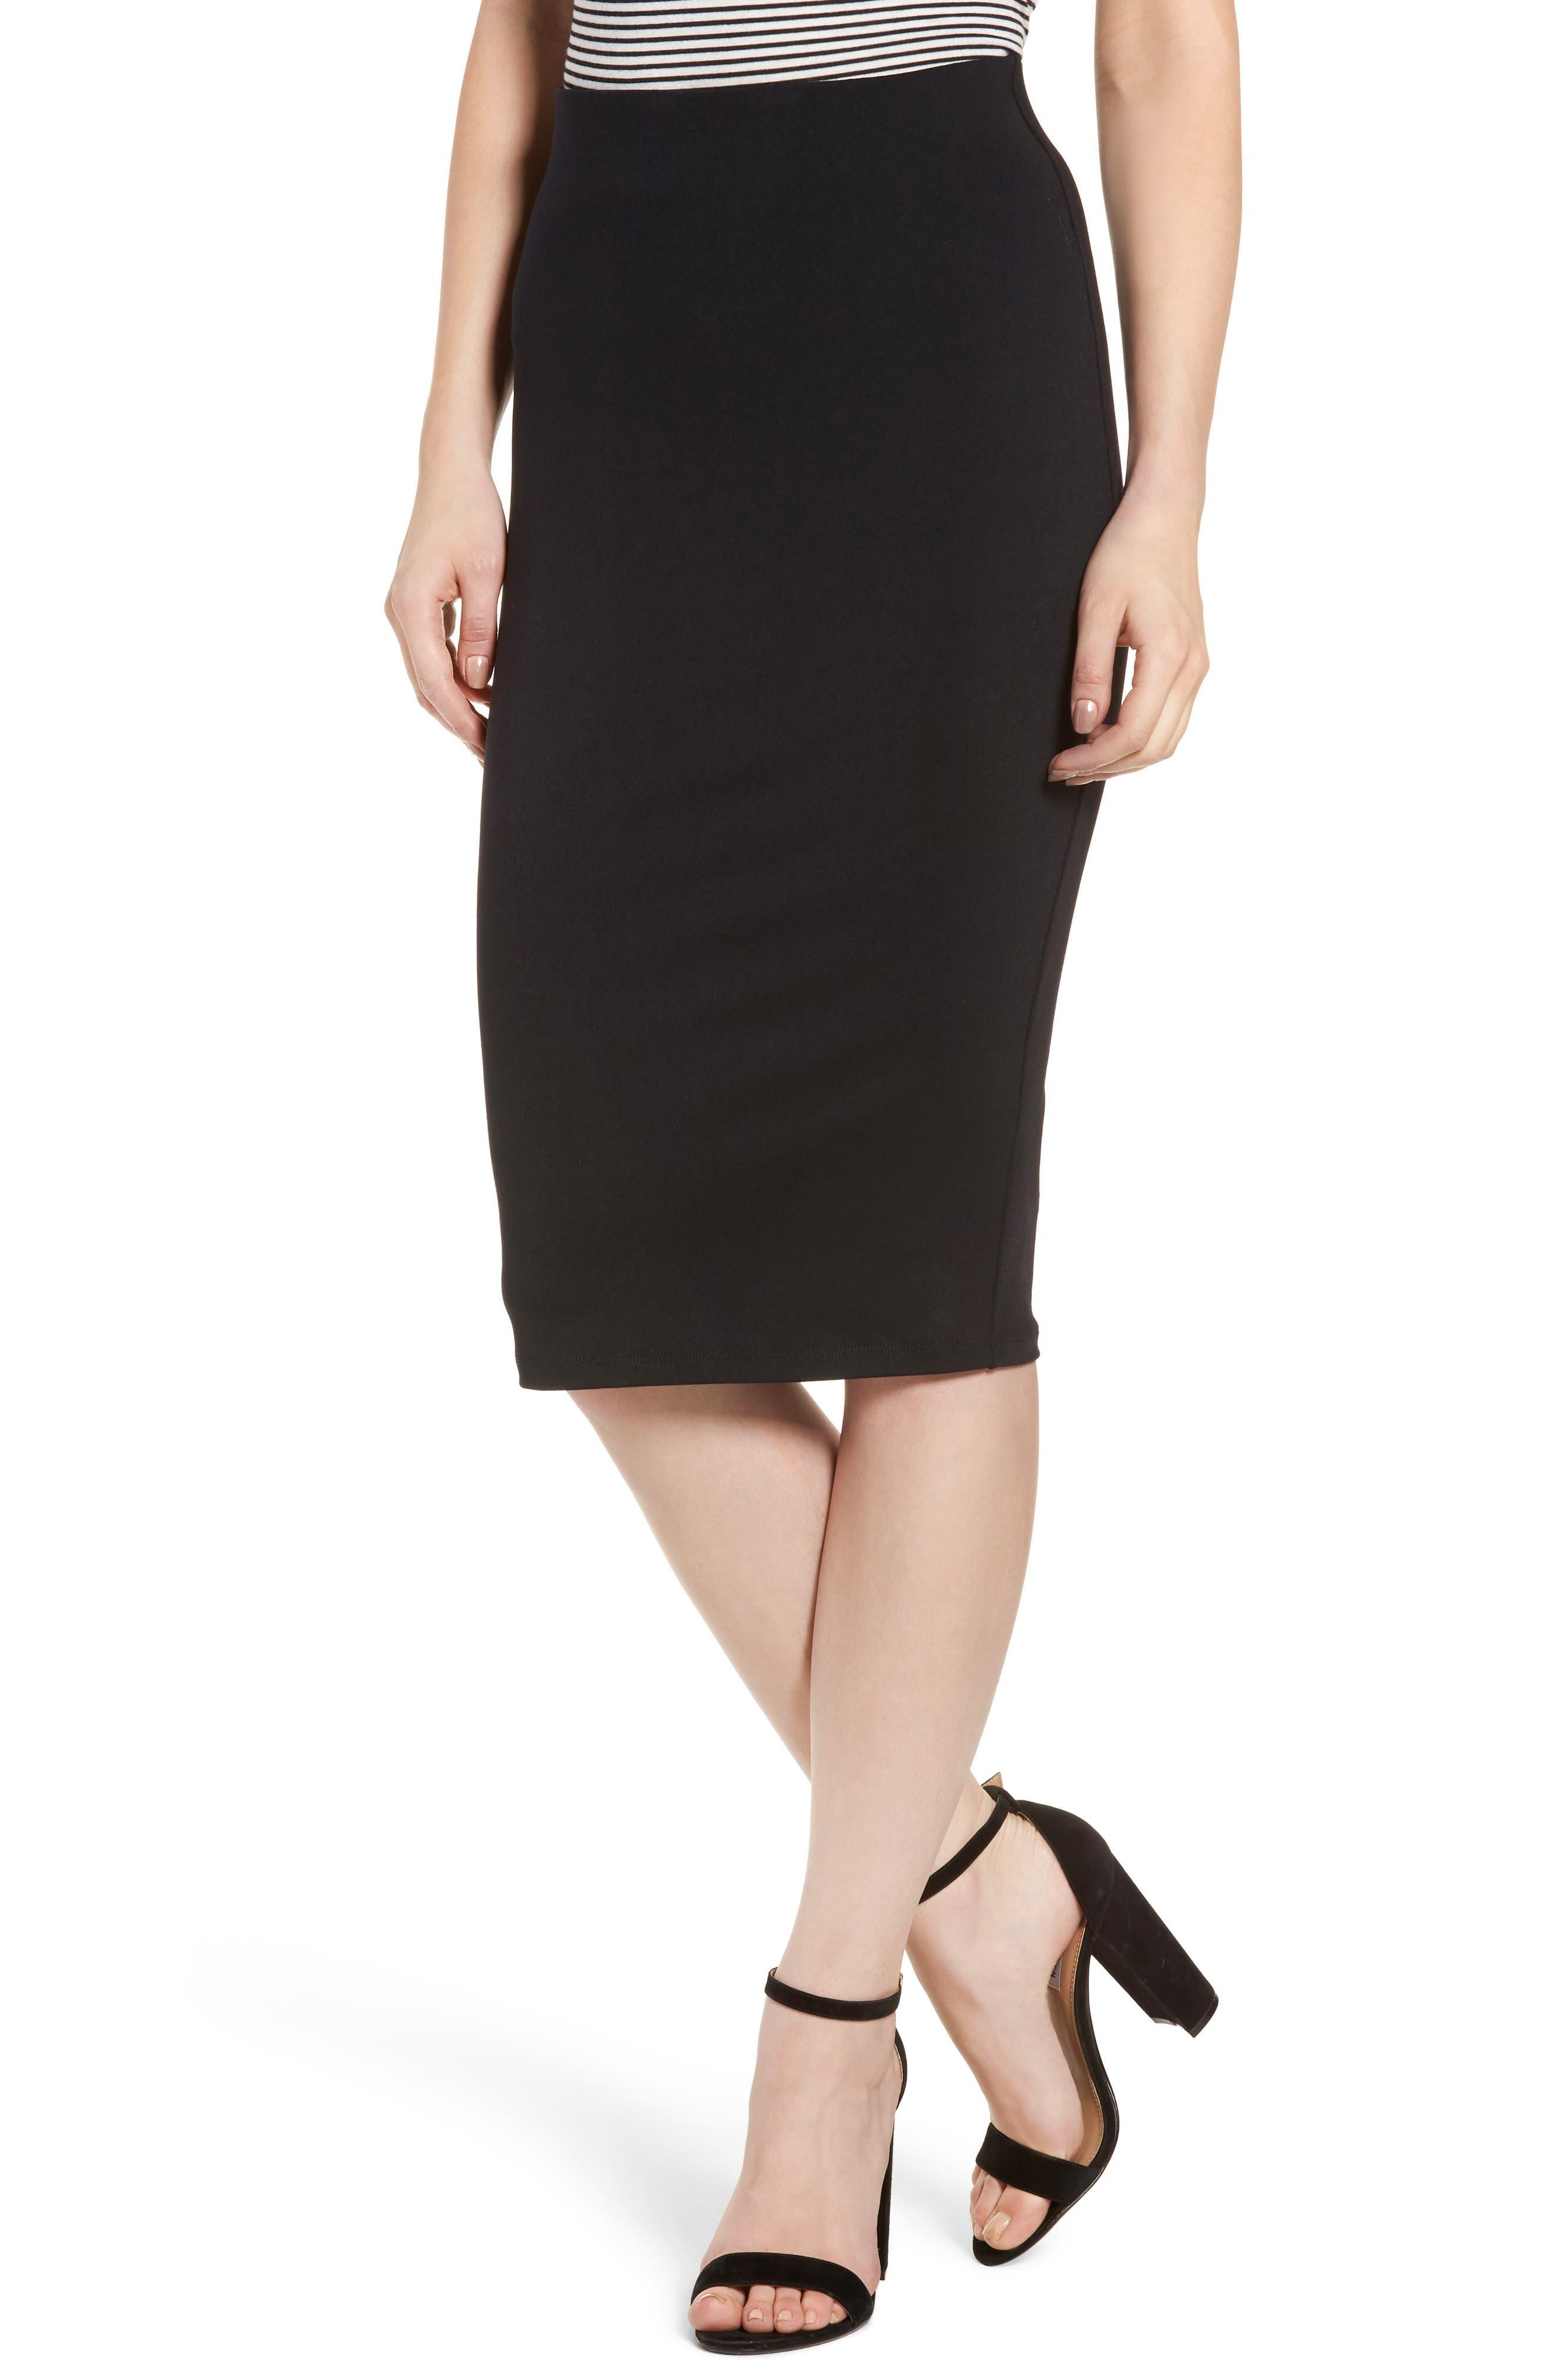 David Lerner Tube High Rise Pencil Skirt